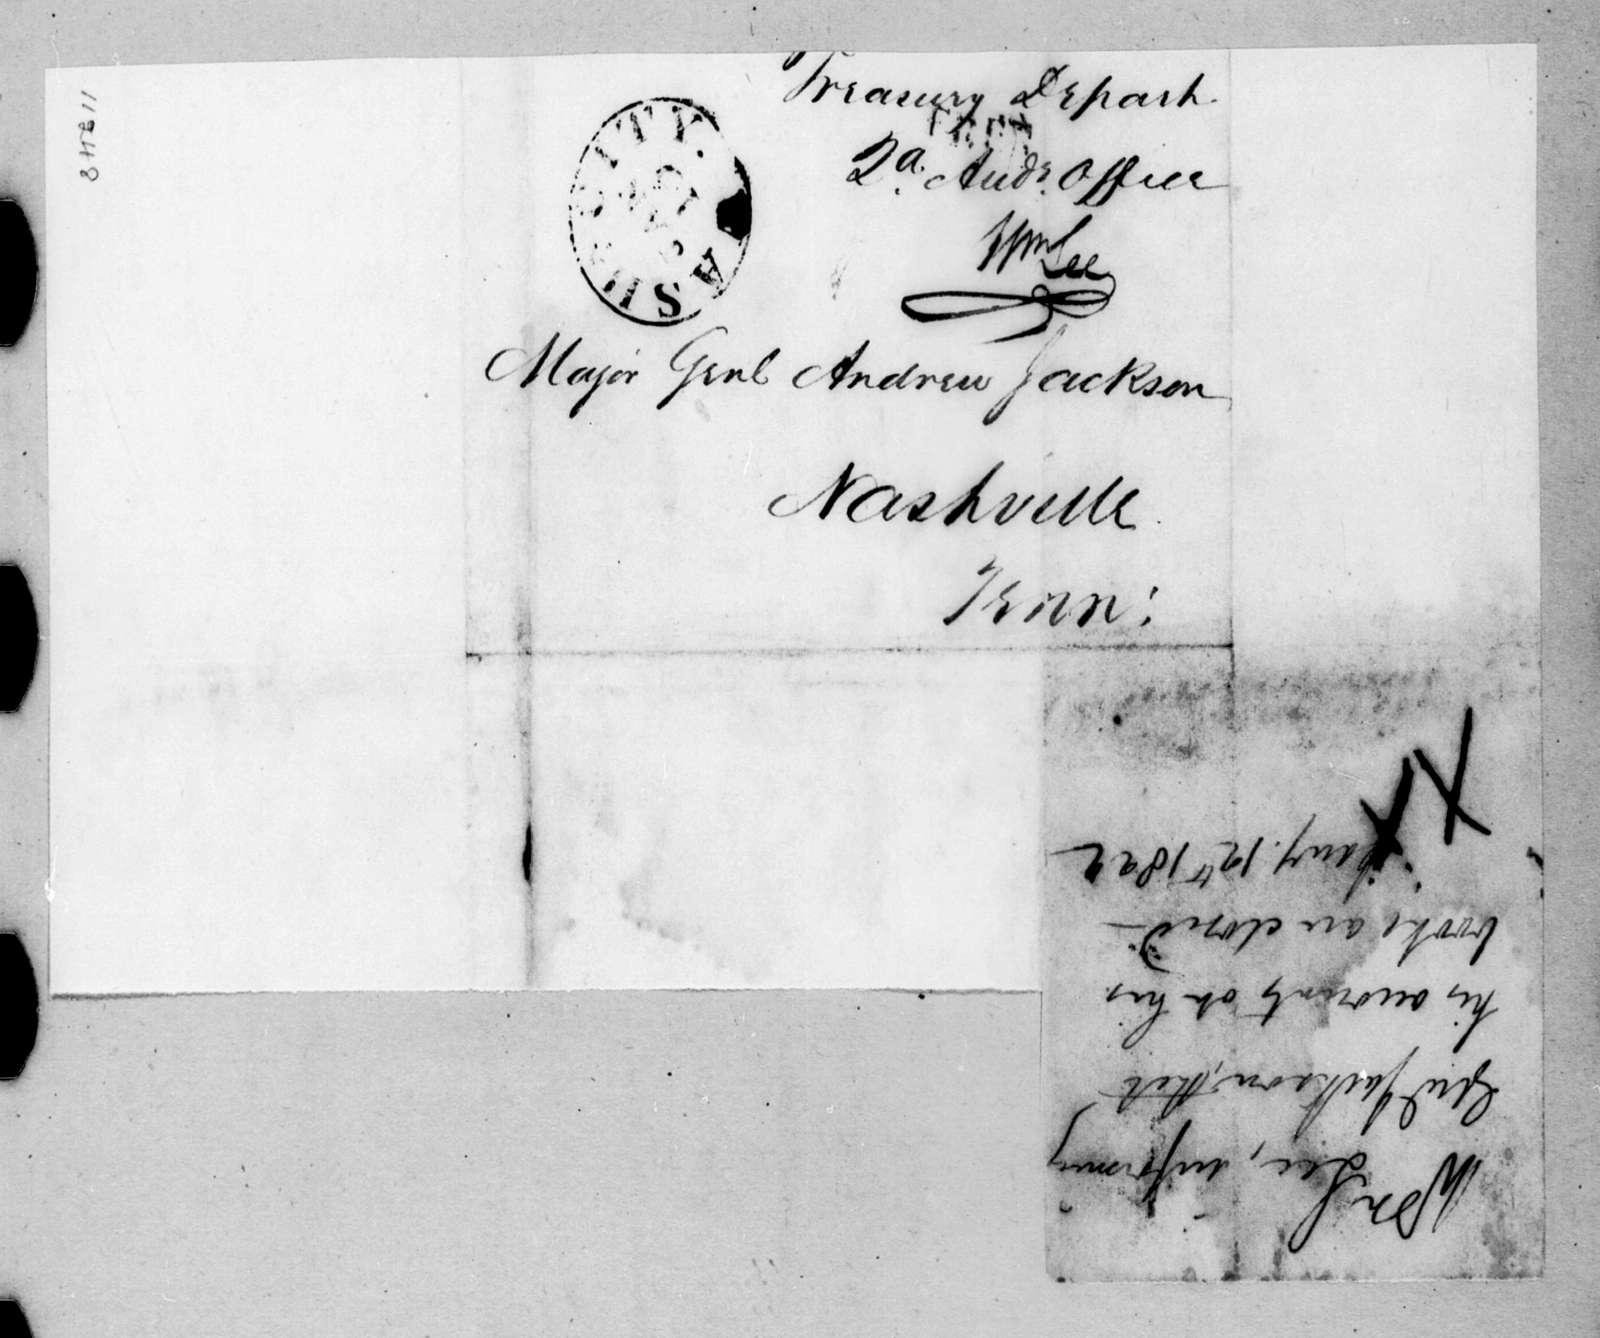 William Lee to Andrew Jackson, January 12, 1822